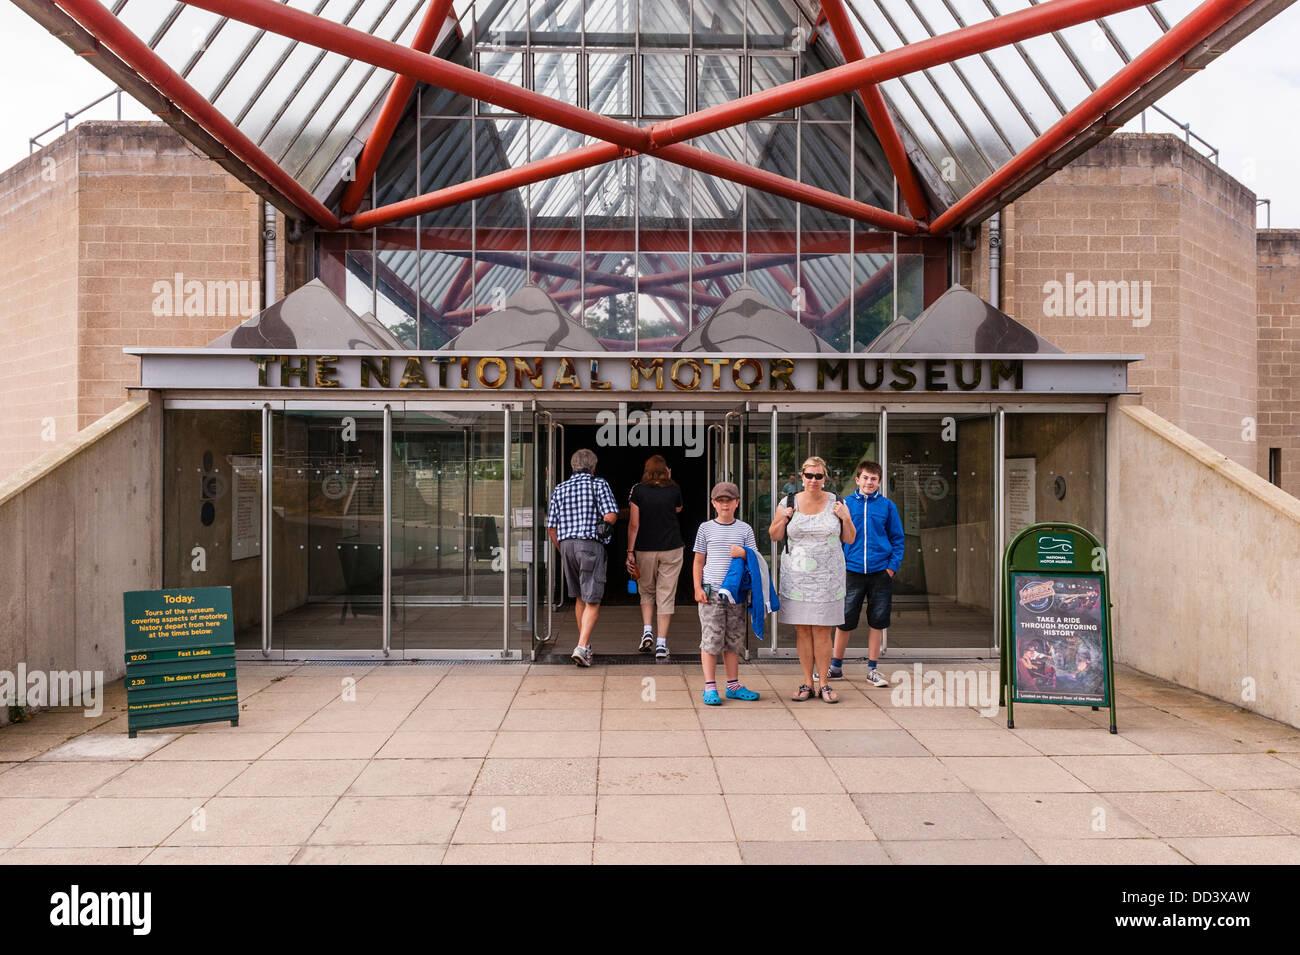 Das National Motor Museum in Beaulieu in Beaulieu, Hampshire, England, Großbritannien, Uk Stockbild